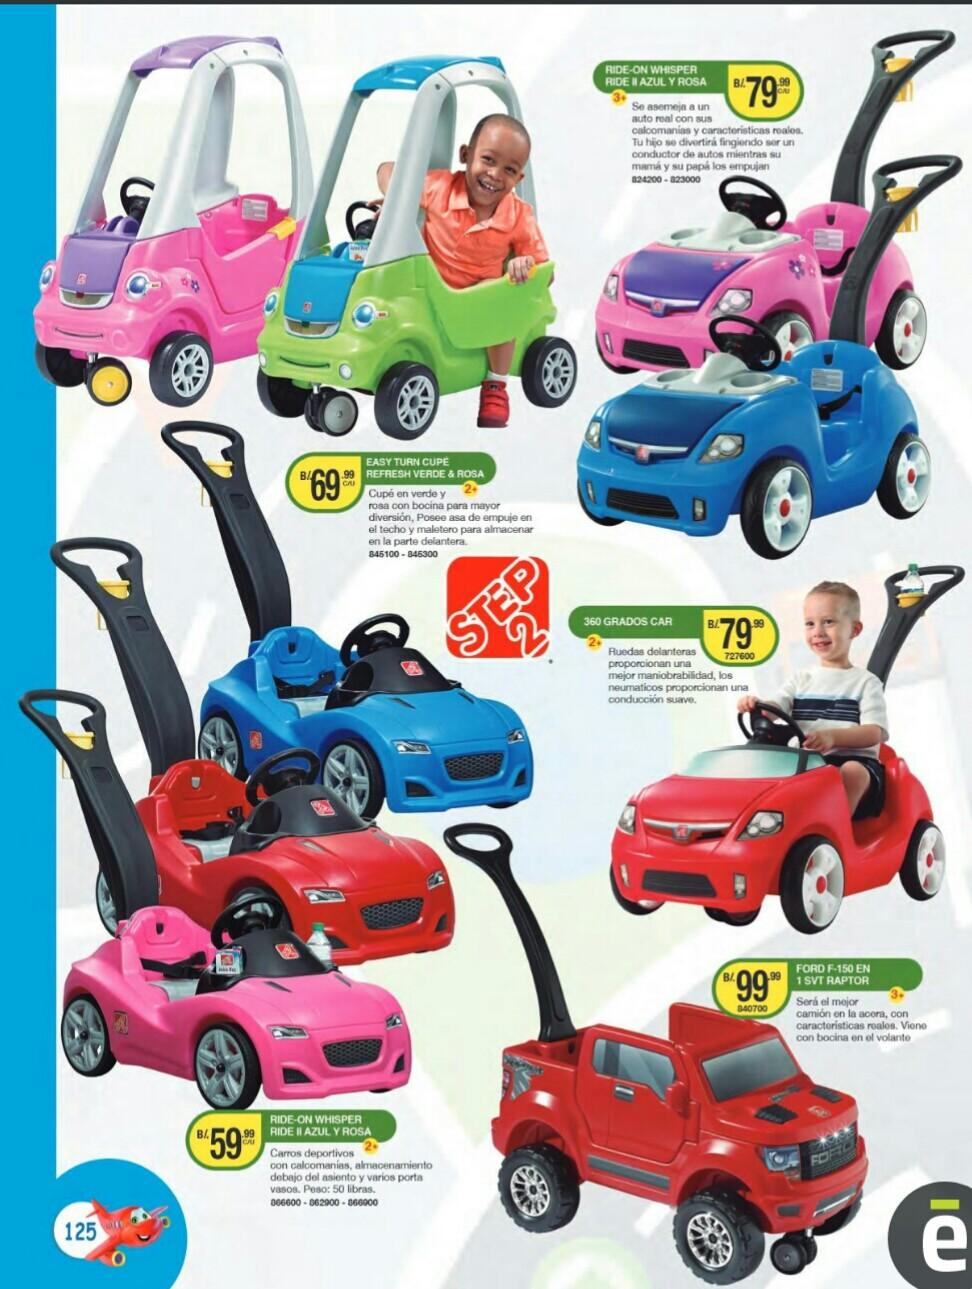 Catalogo juguetes Titan Toys 2019 p125